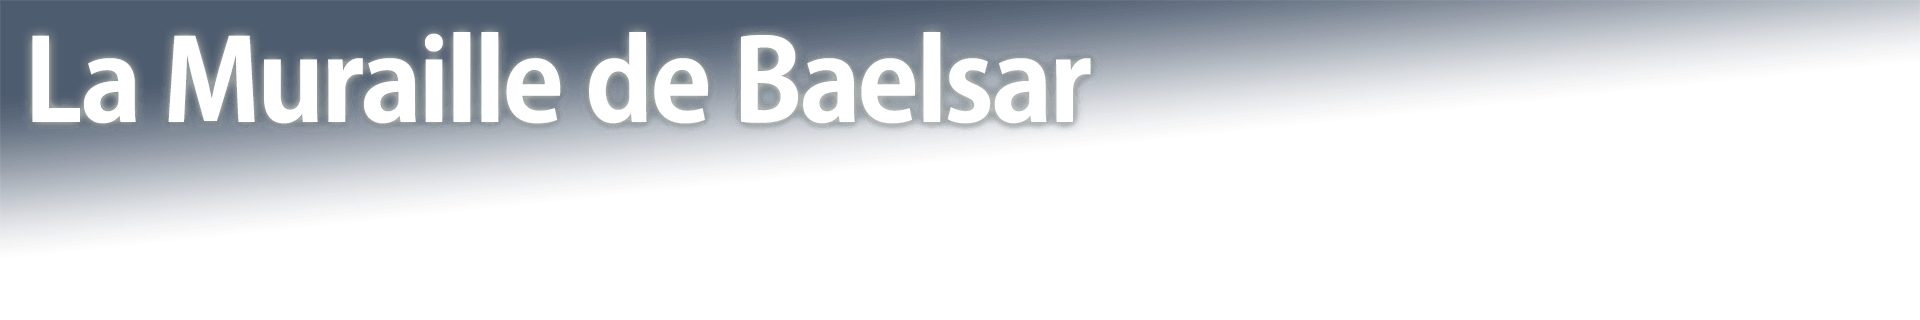 La Muraille de Baelsar